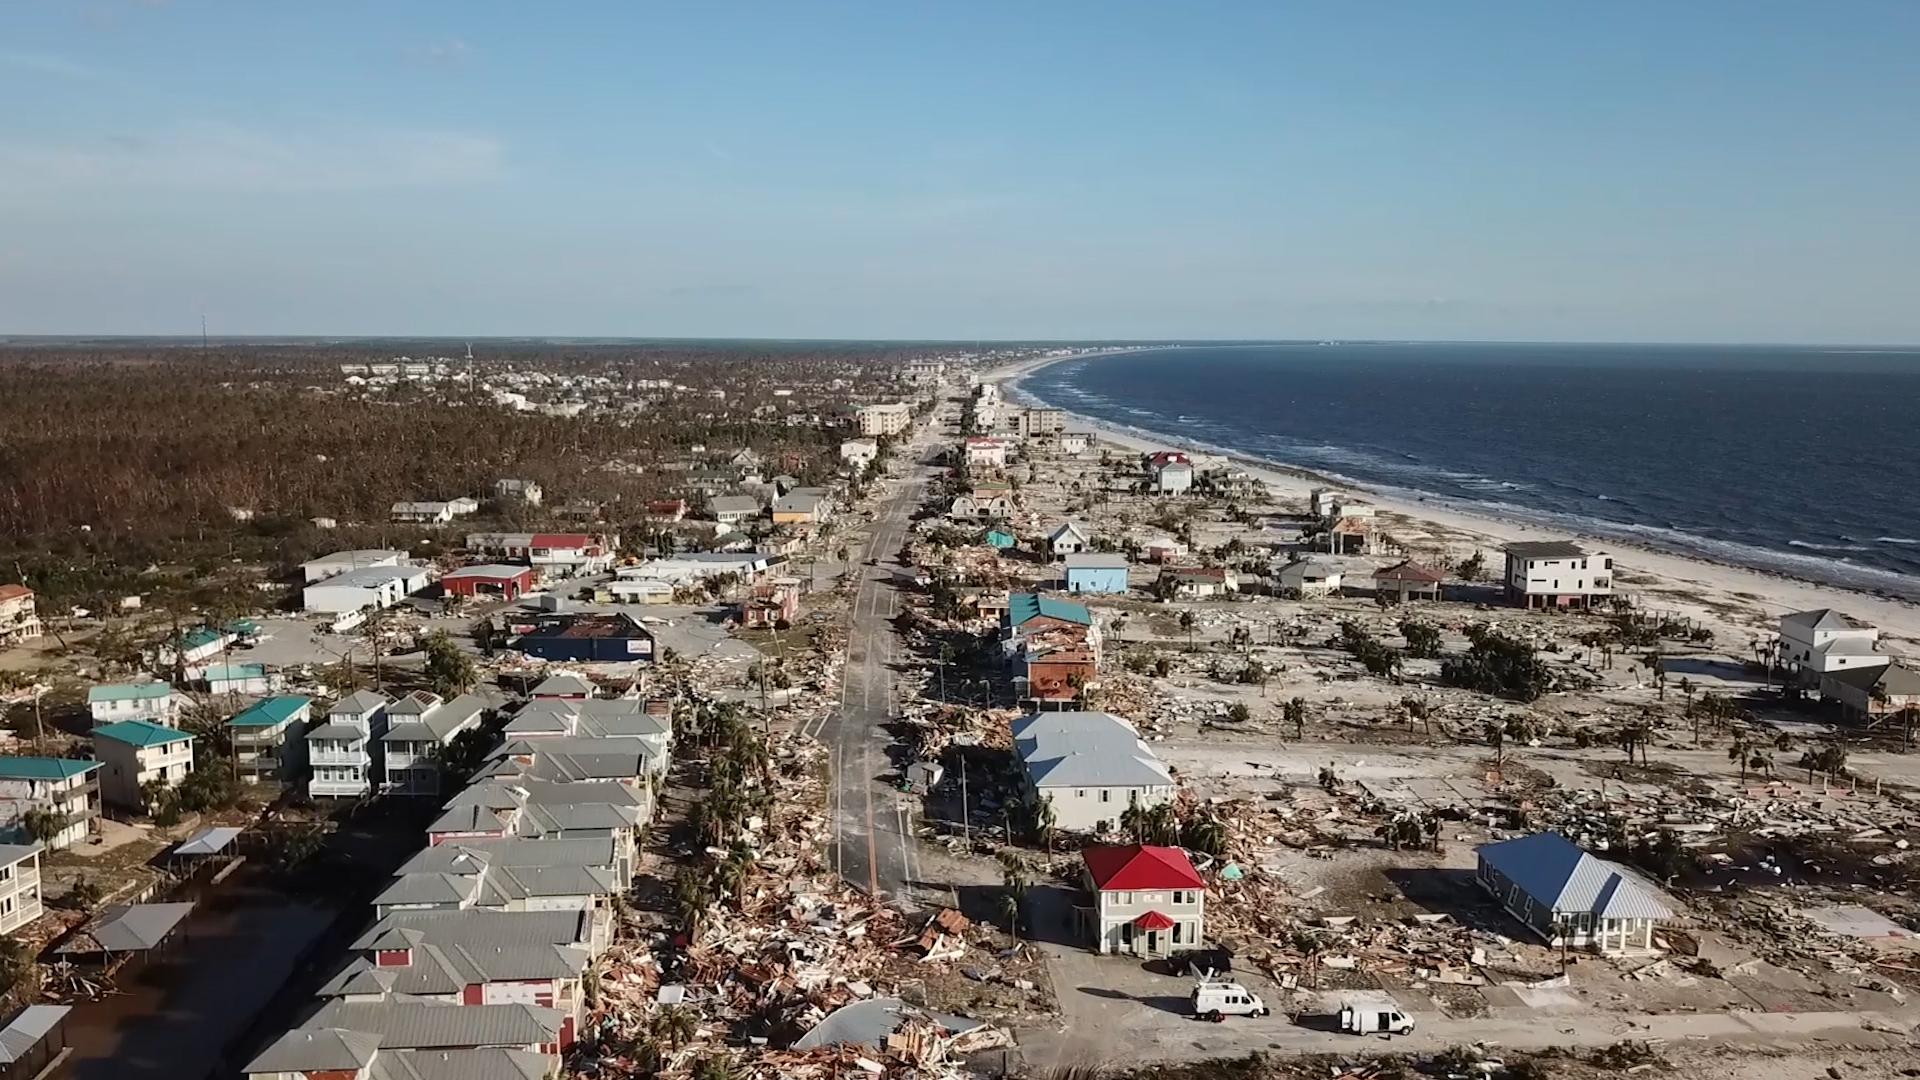 Hurricane Michael aftermath: Storm leaves death, devastation across Southeast